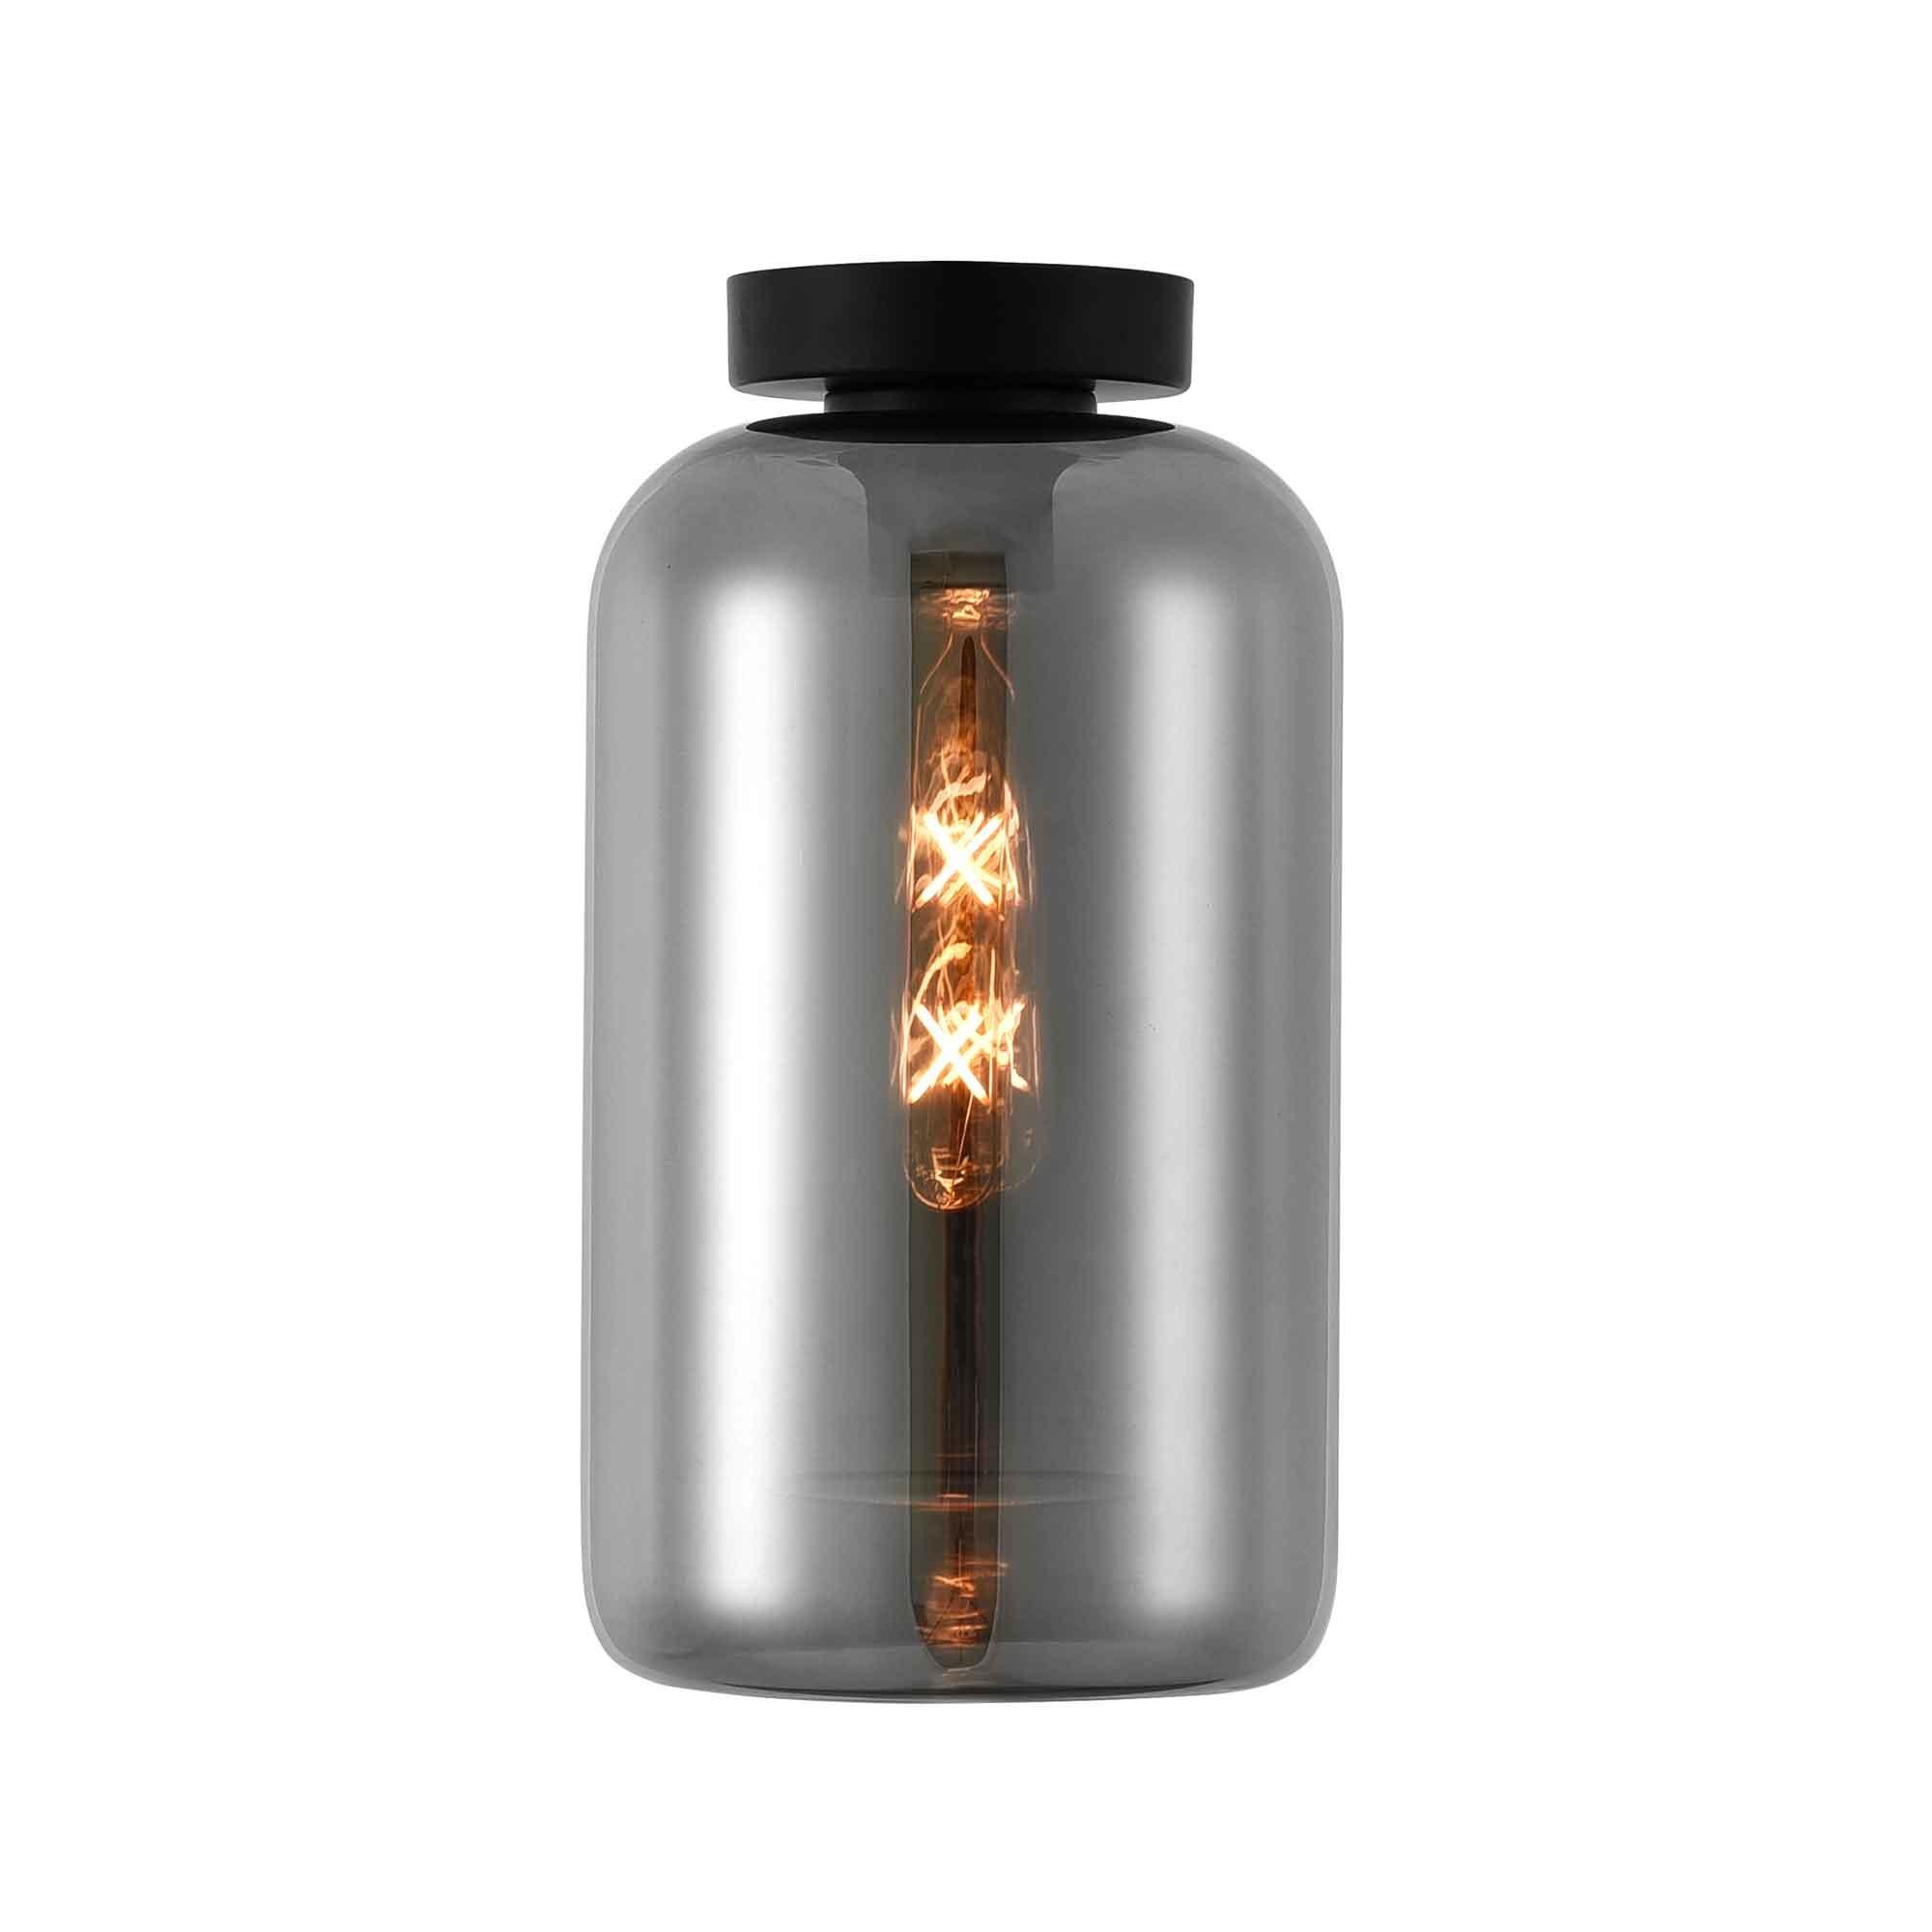 Artdelight Plafondlamp Botany Ø 18 cm rook glas zwart